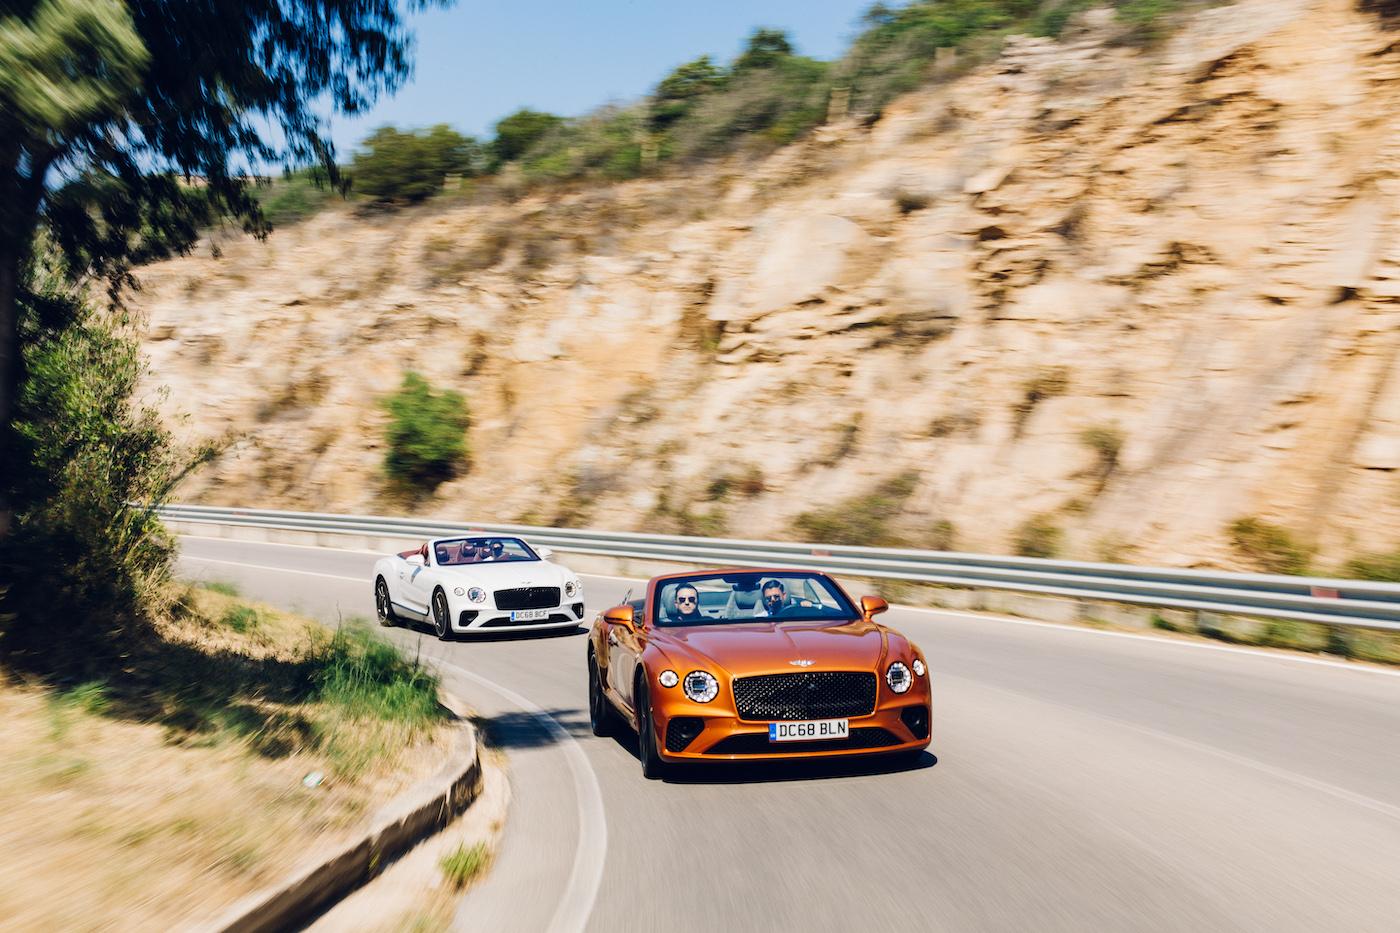 Mit Bentley in Porto Cervo: Die Bentley Summer Tour 2019 13